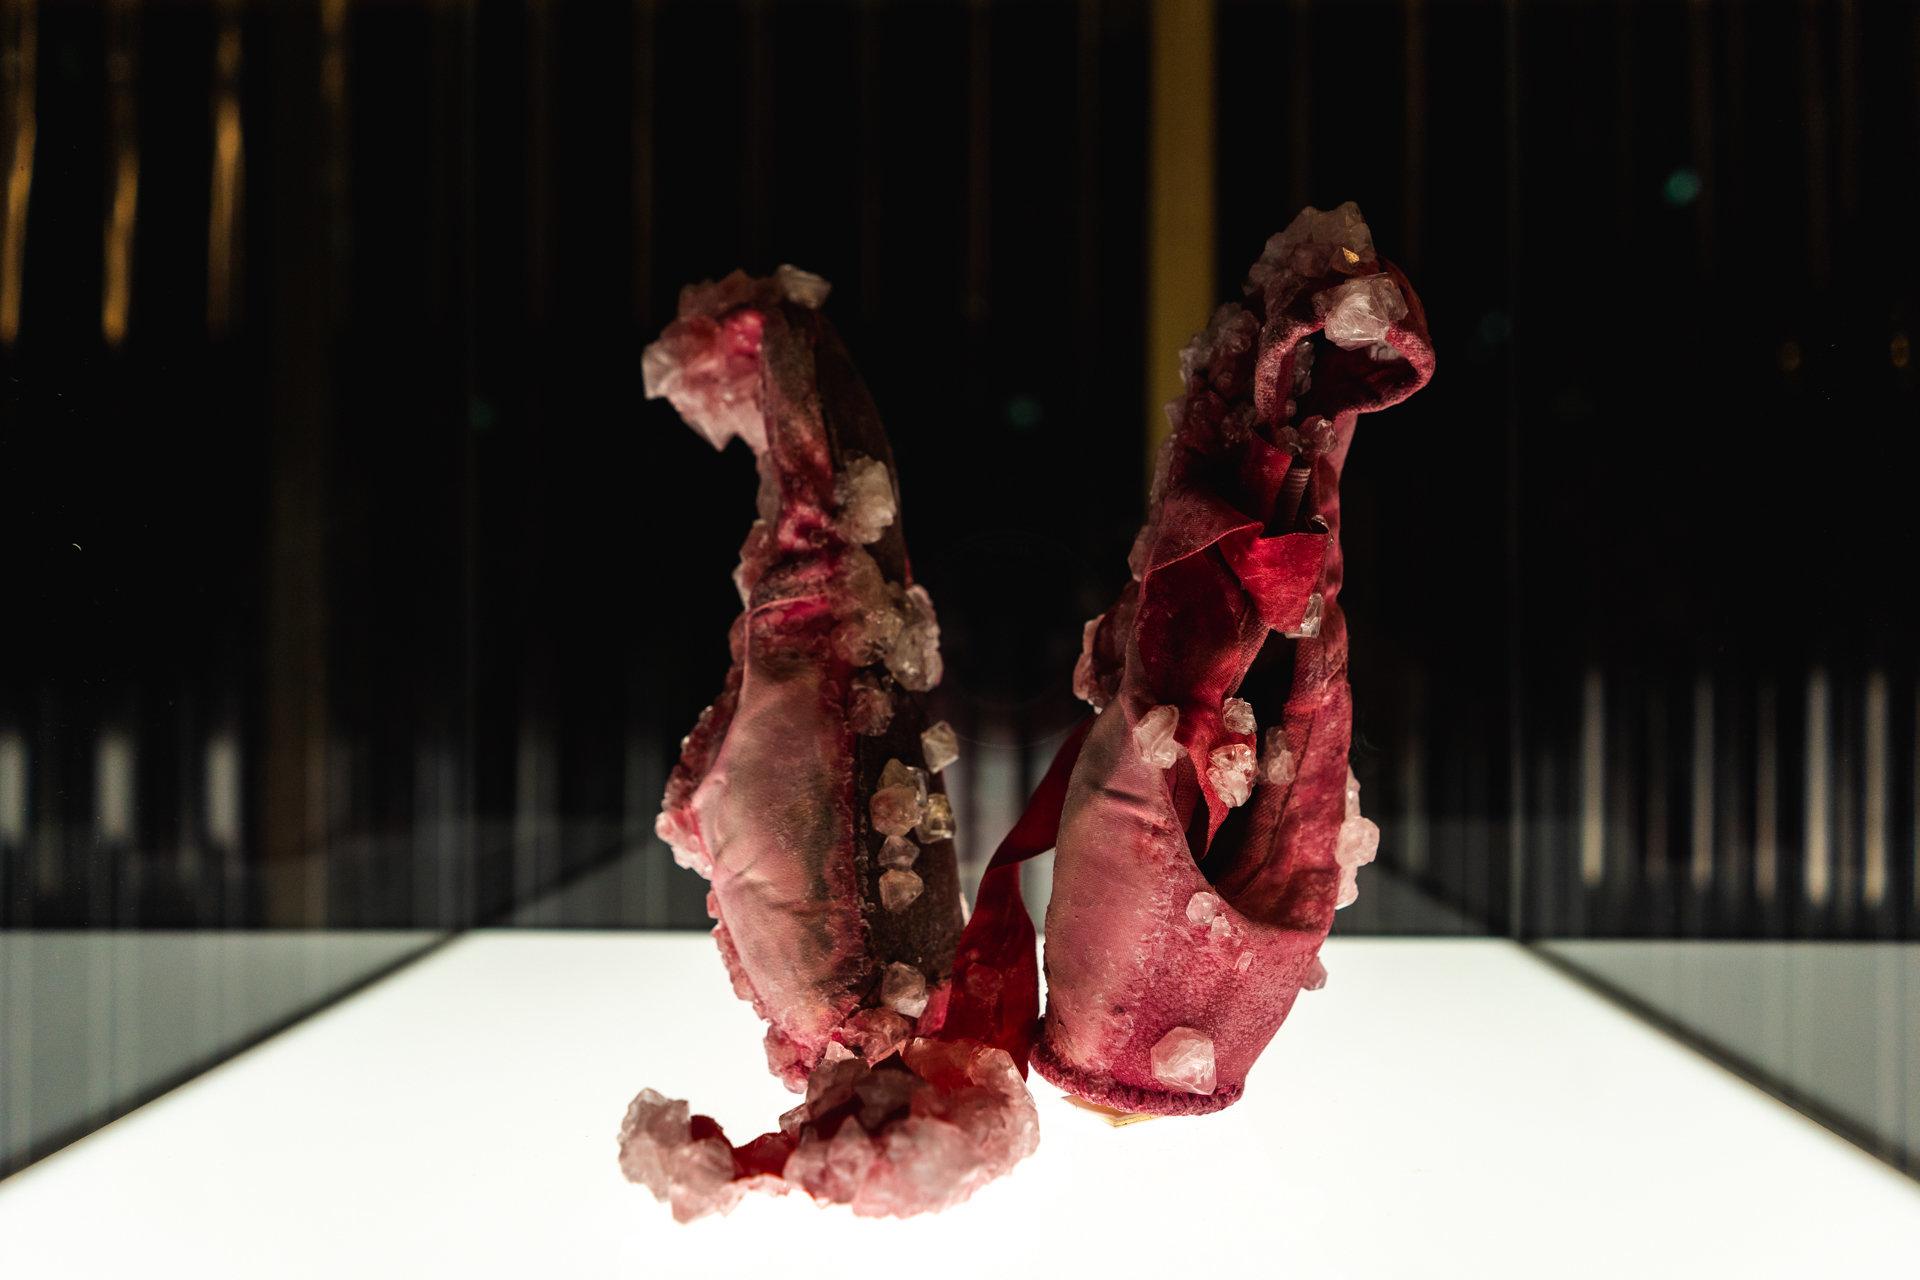 Body-fluid art: Η κορυφαία τεχνολογία παραμένει το σώμα μας, λέει η Άλις